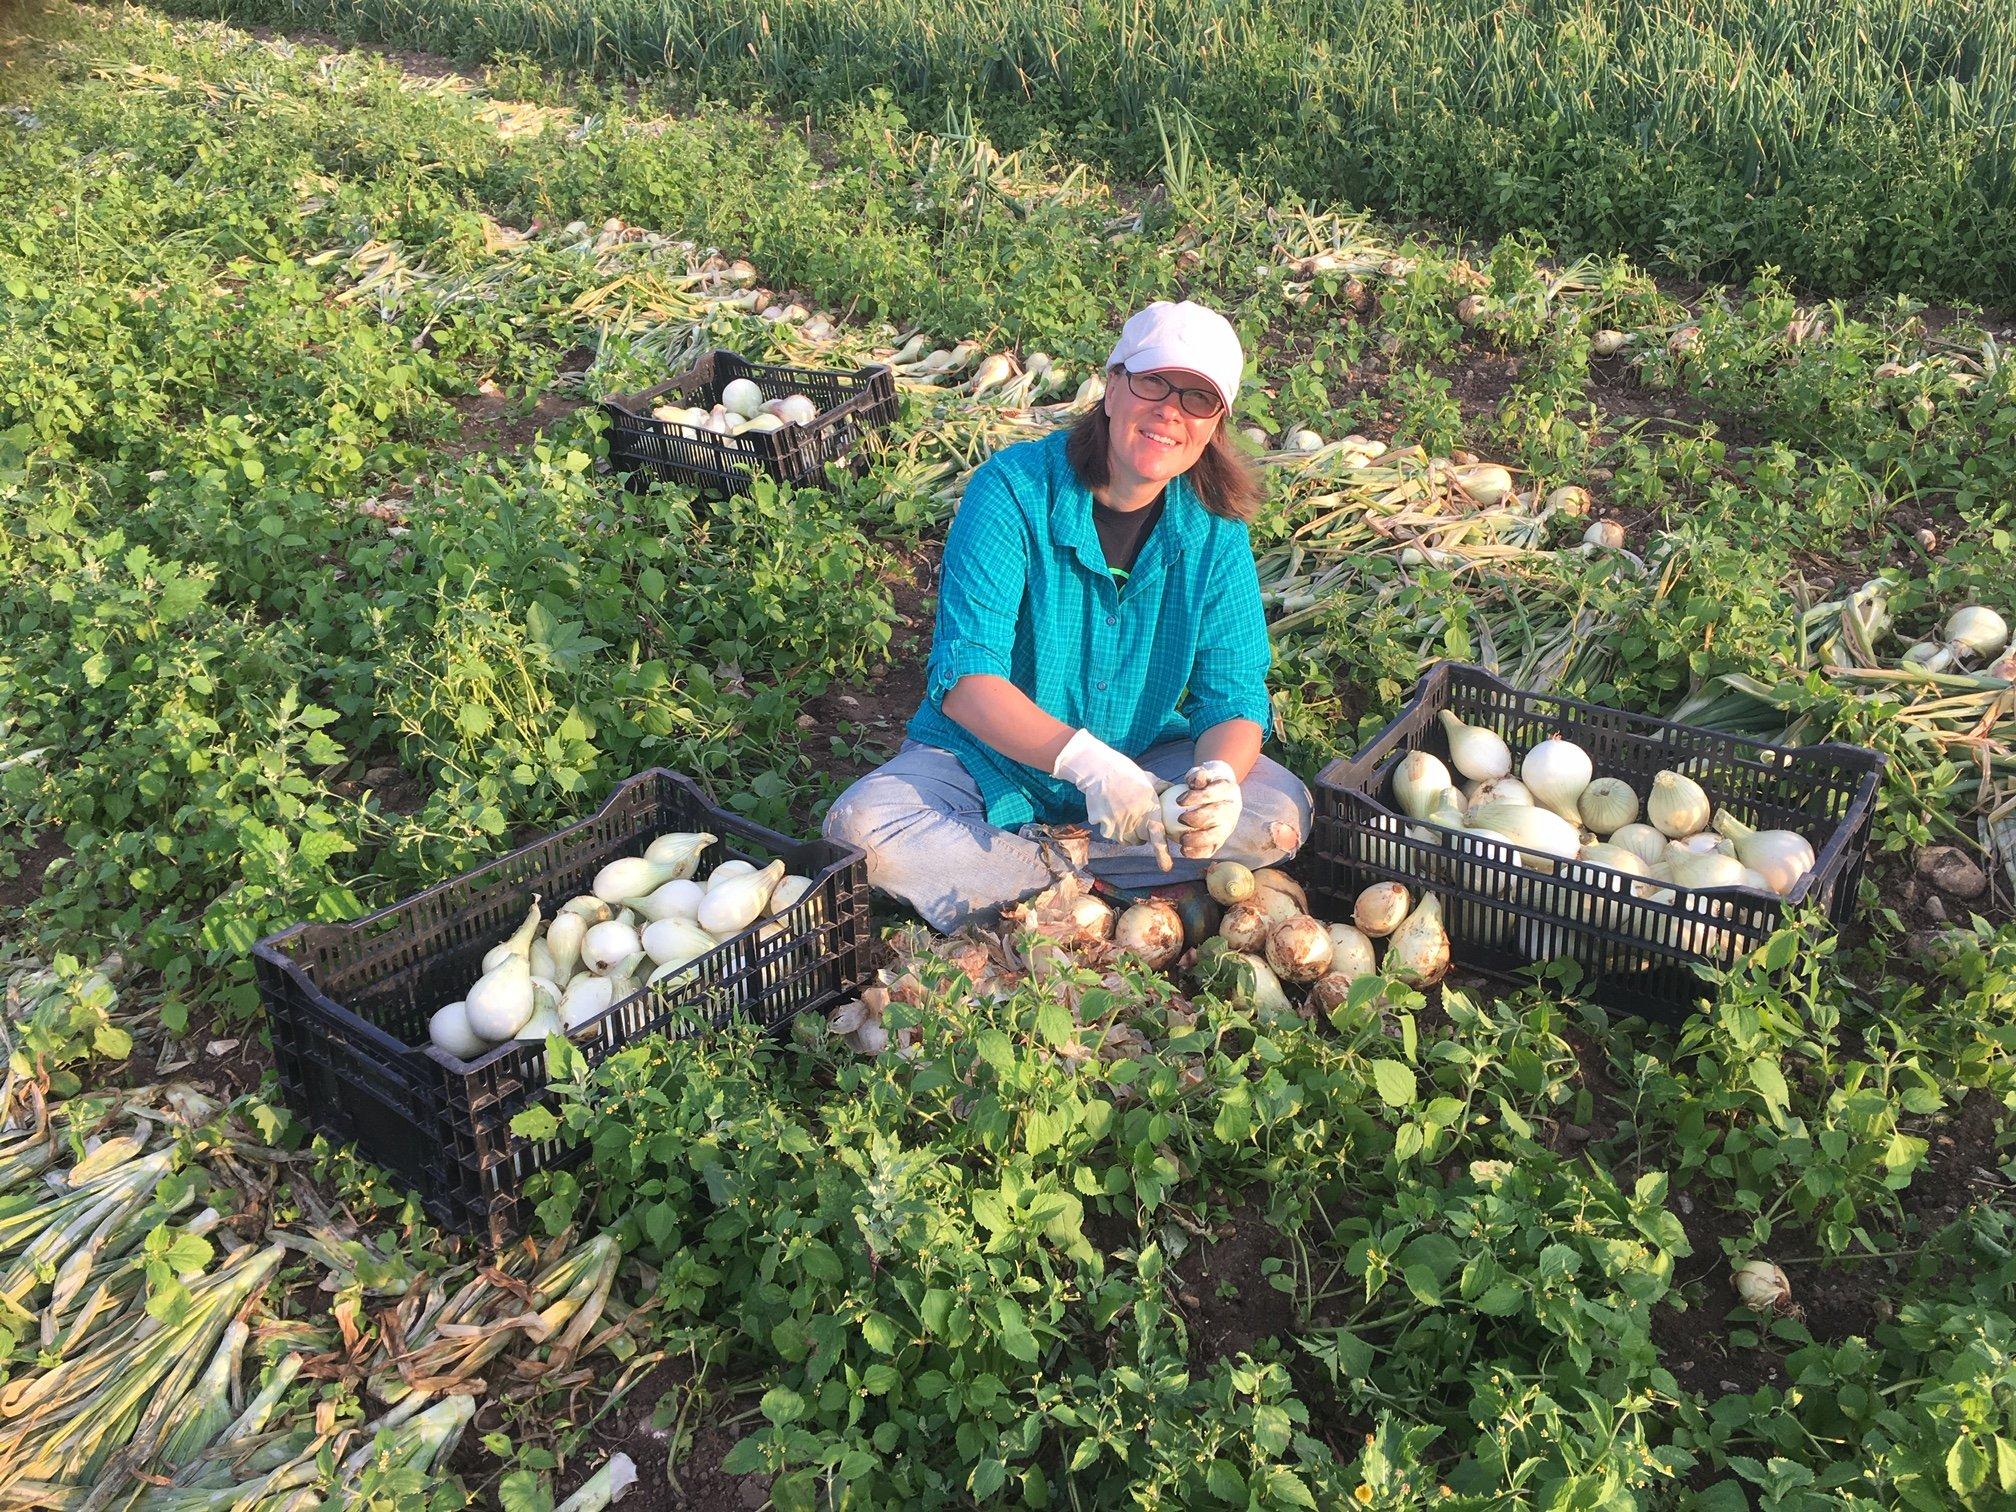 Farm Happenings for July 30, 2019